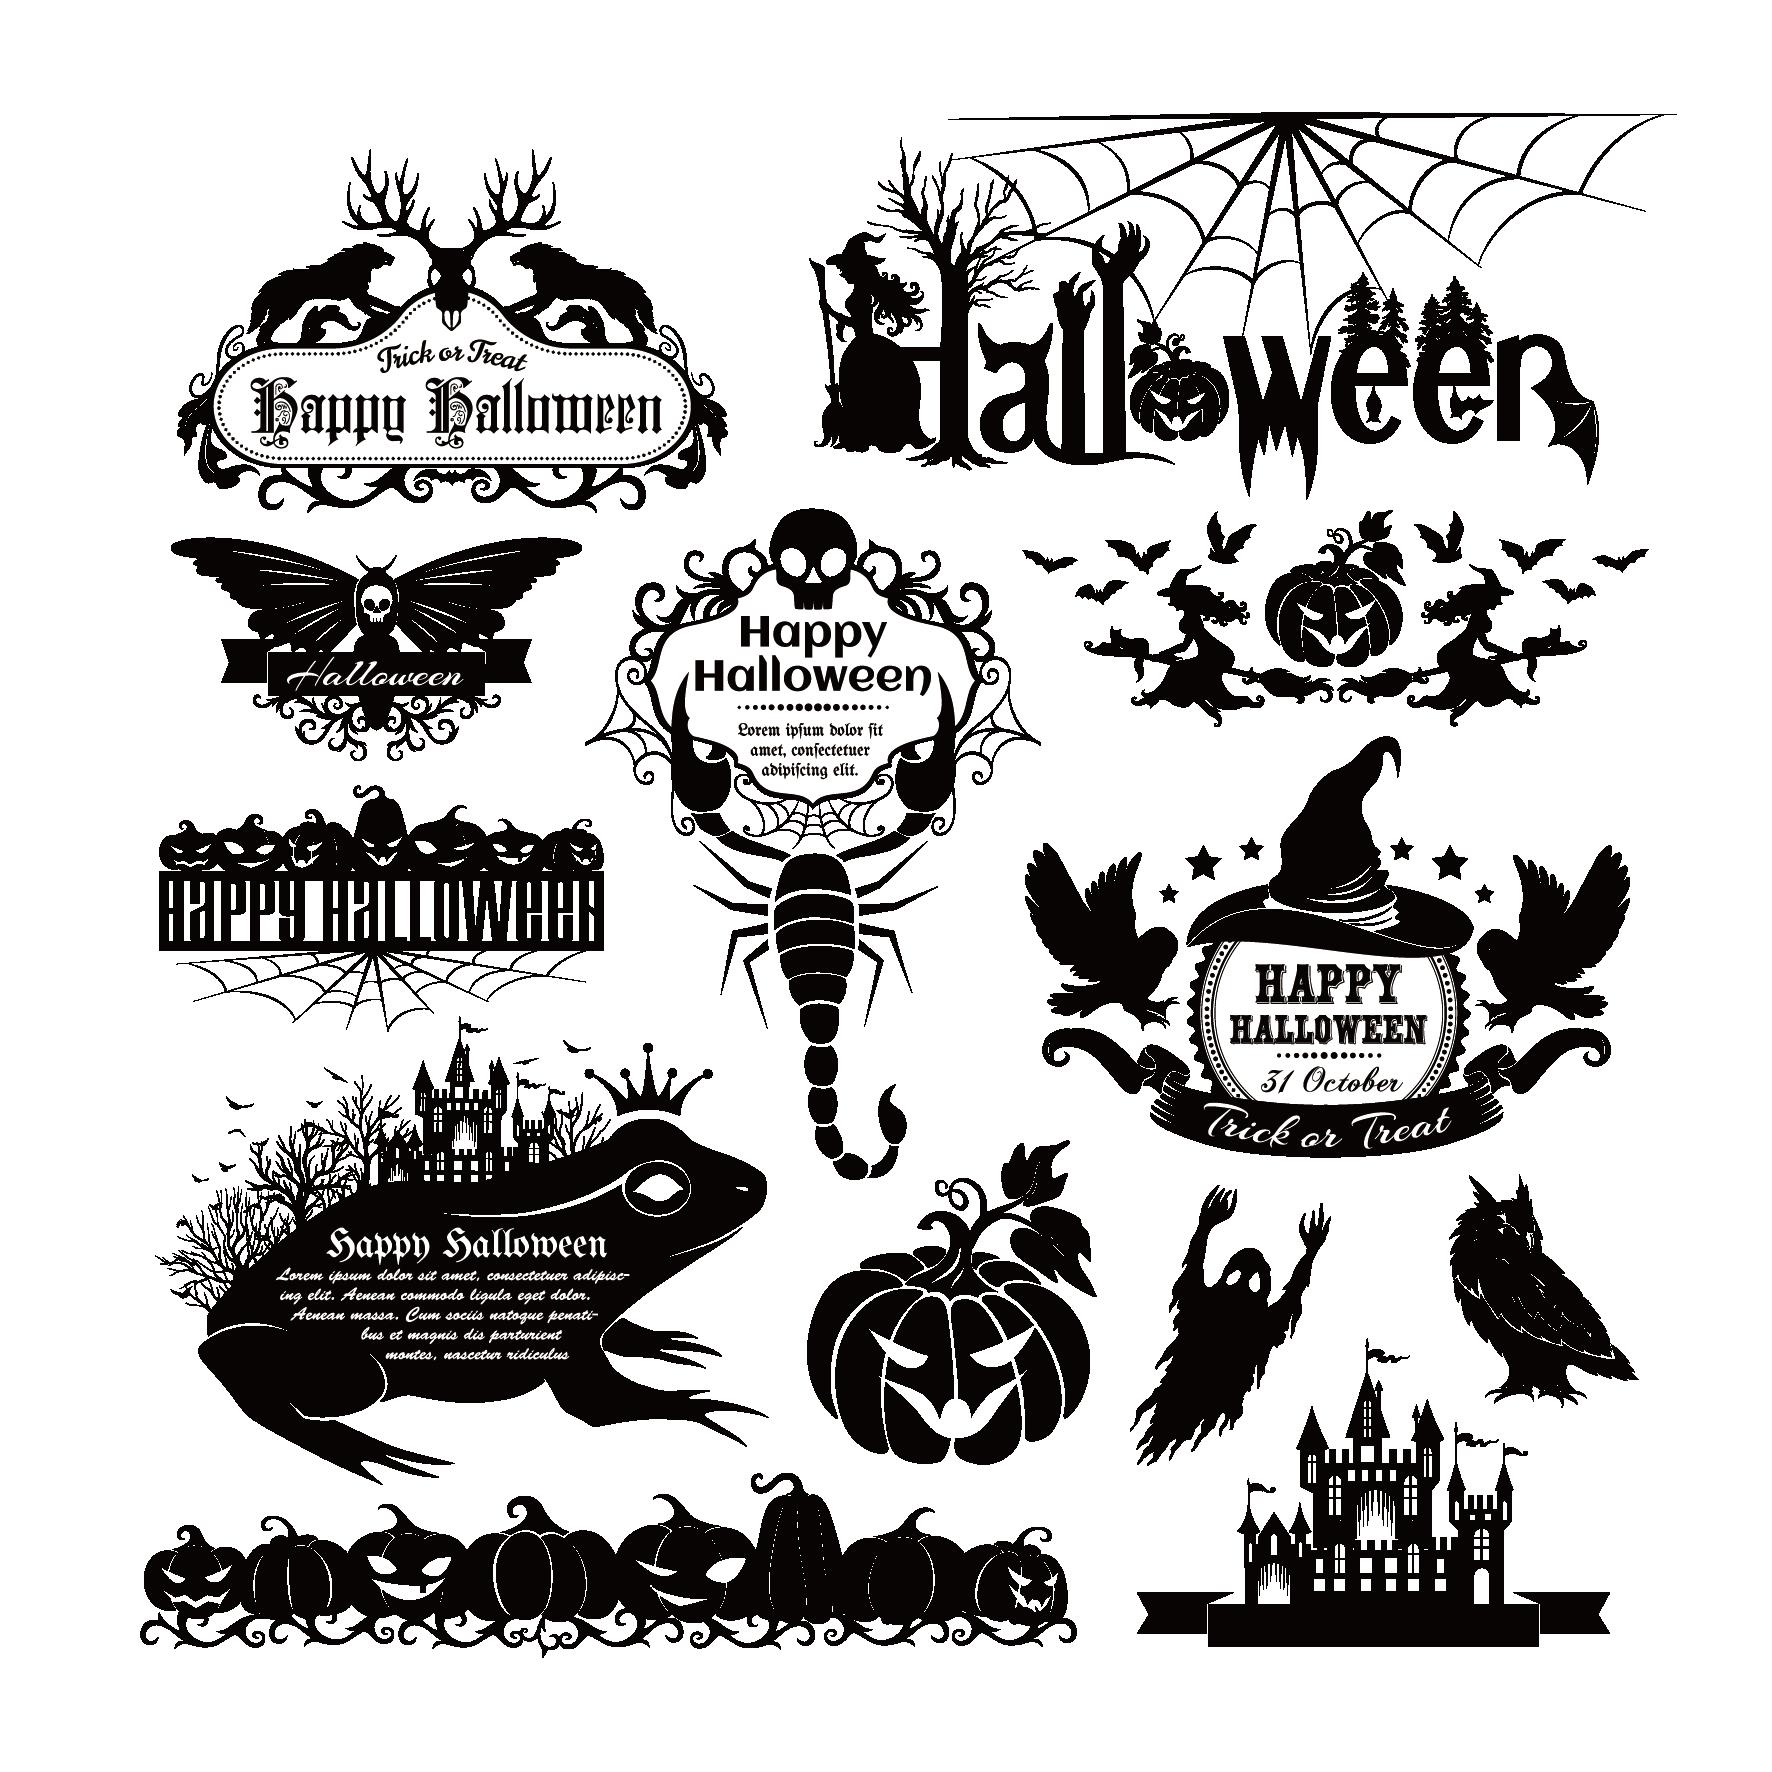 banner transparent download Underwater vector element. Euclidean halloween transprent png